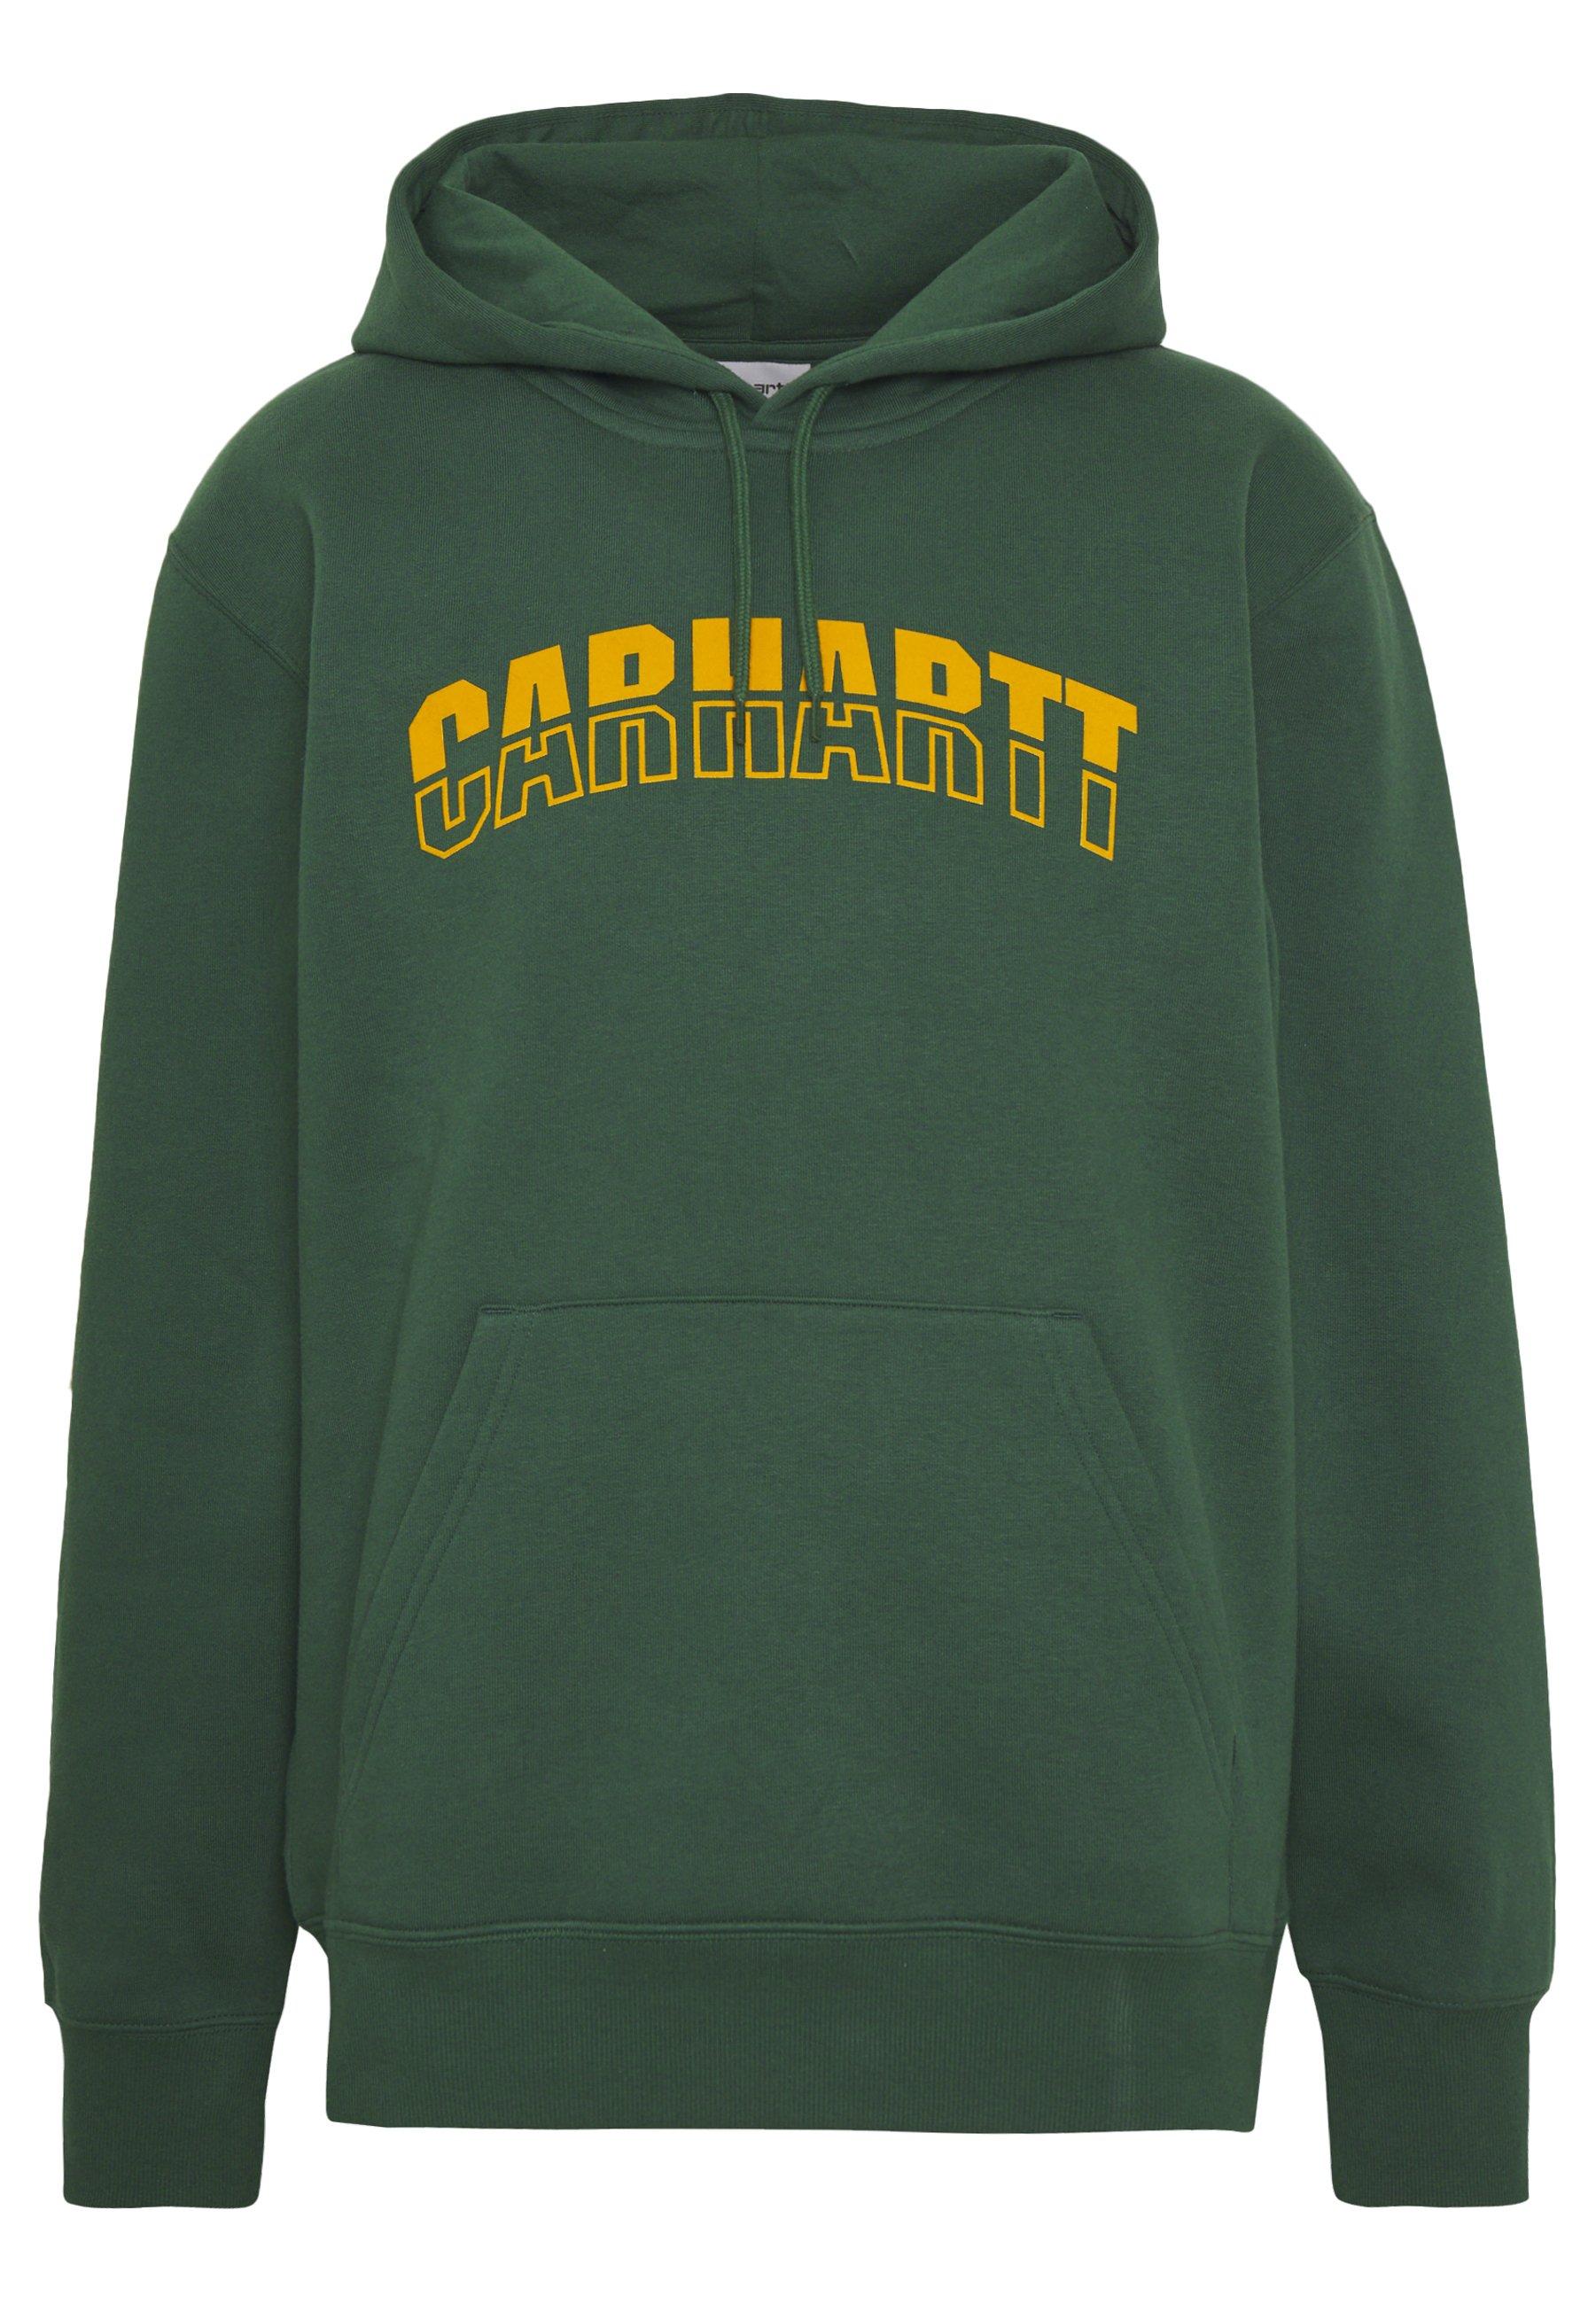 Carhartt WIP HOODED DISTRICT - Bluza z kapturem - dark green/yellow